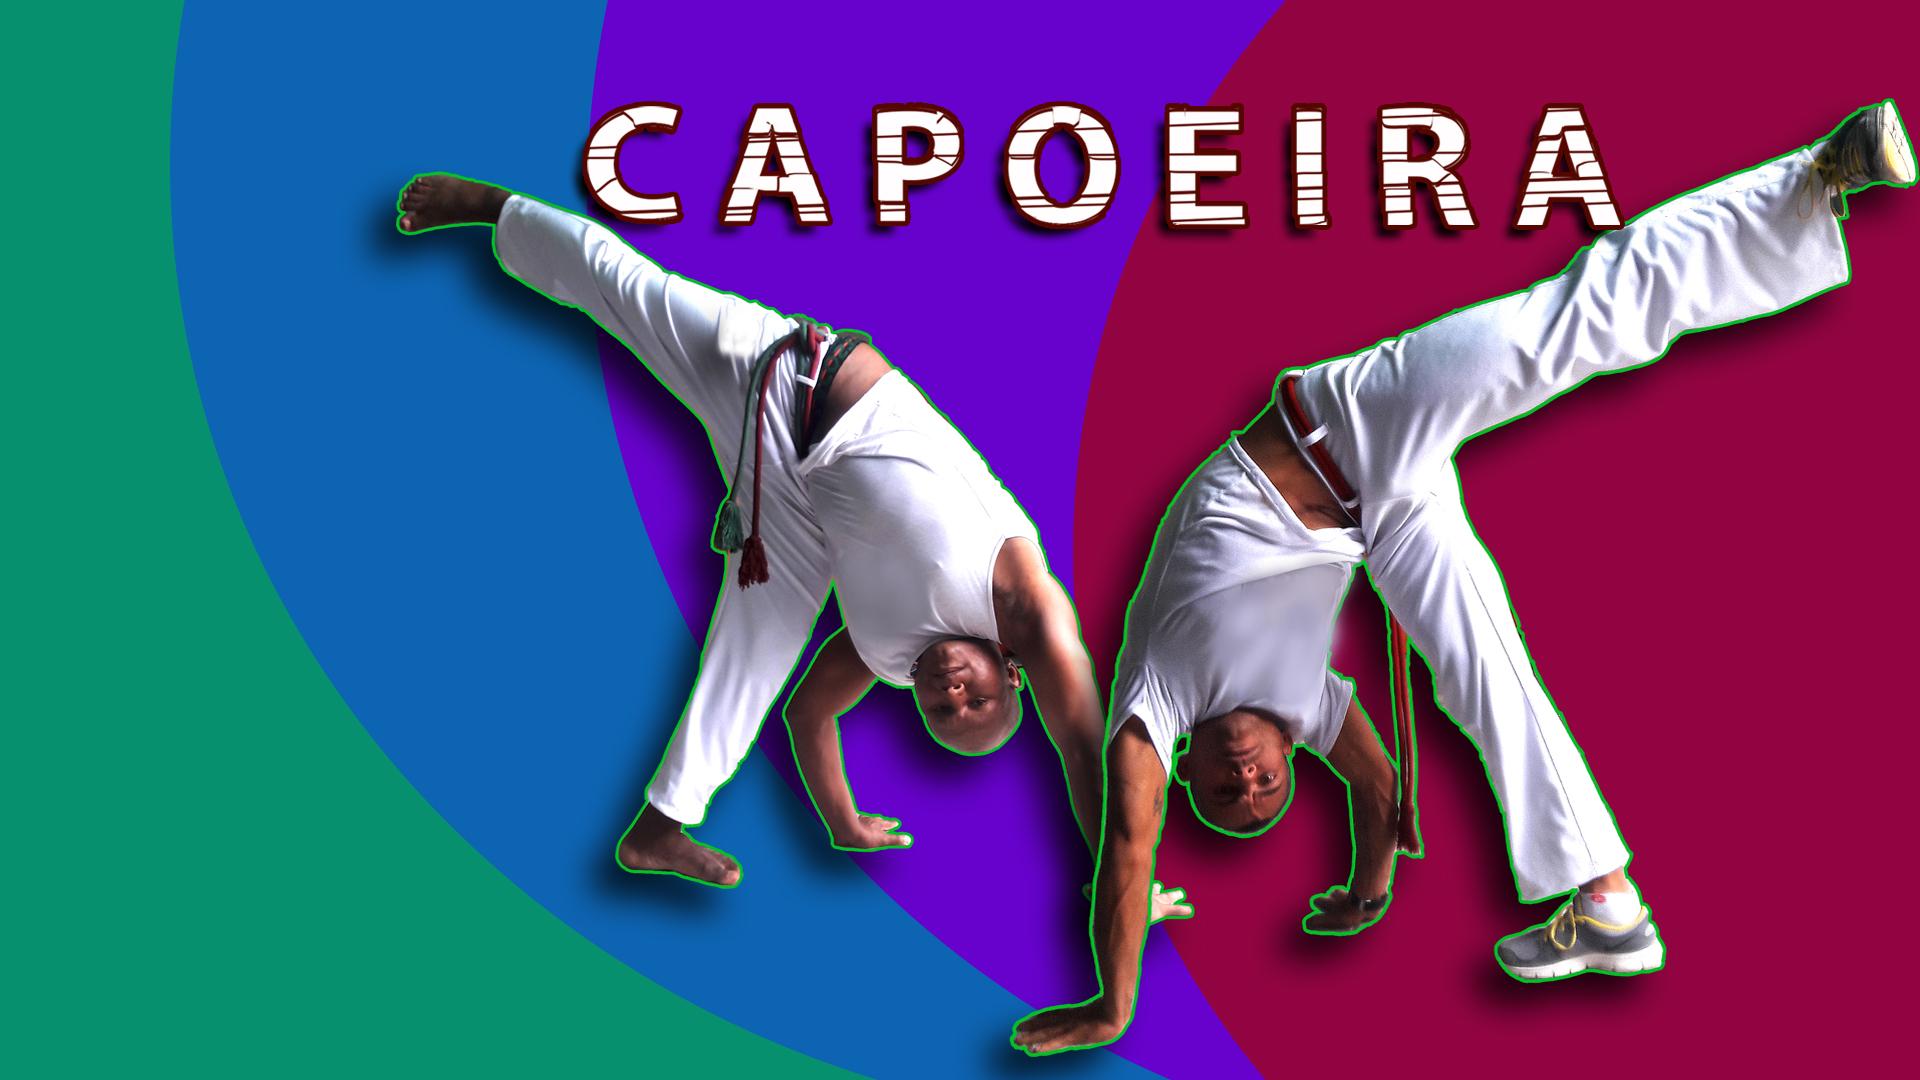 004 Capoeira